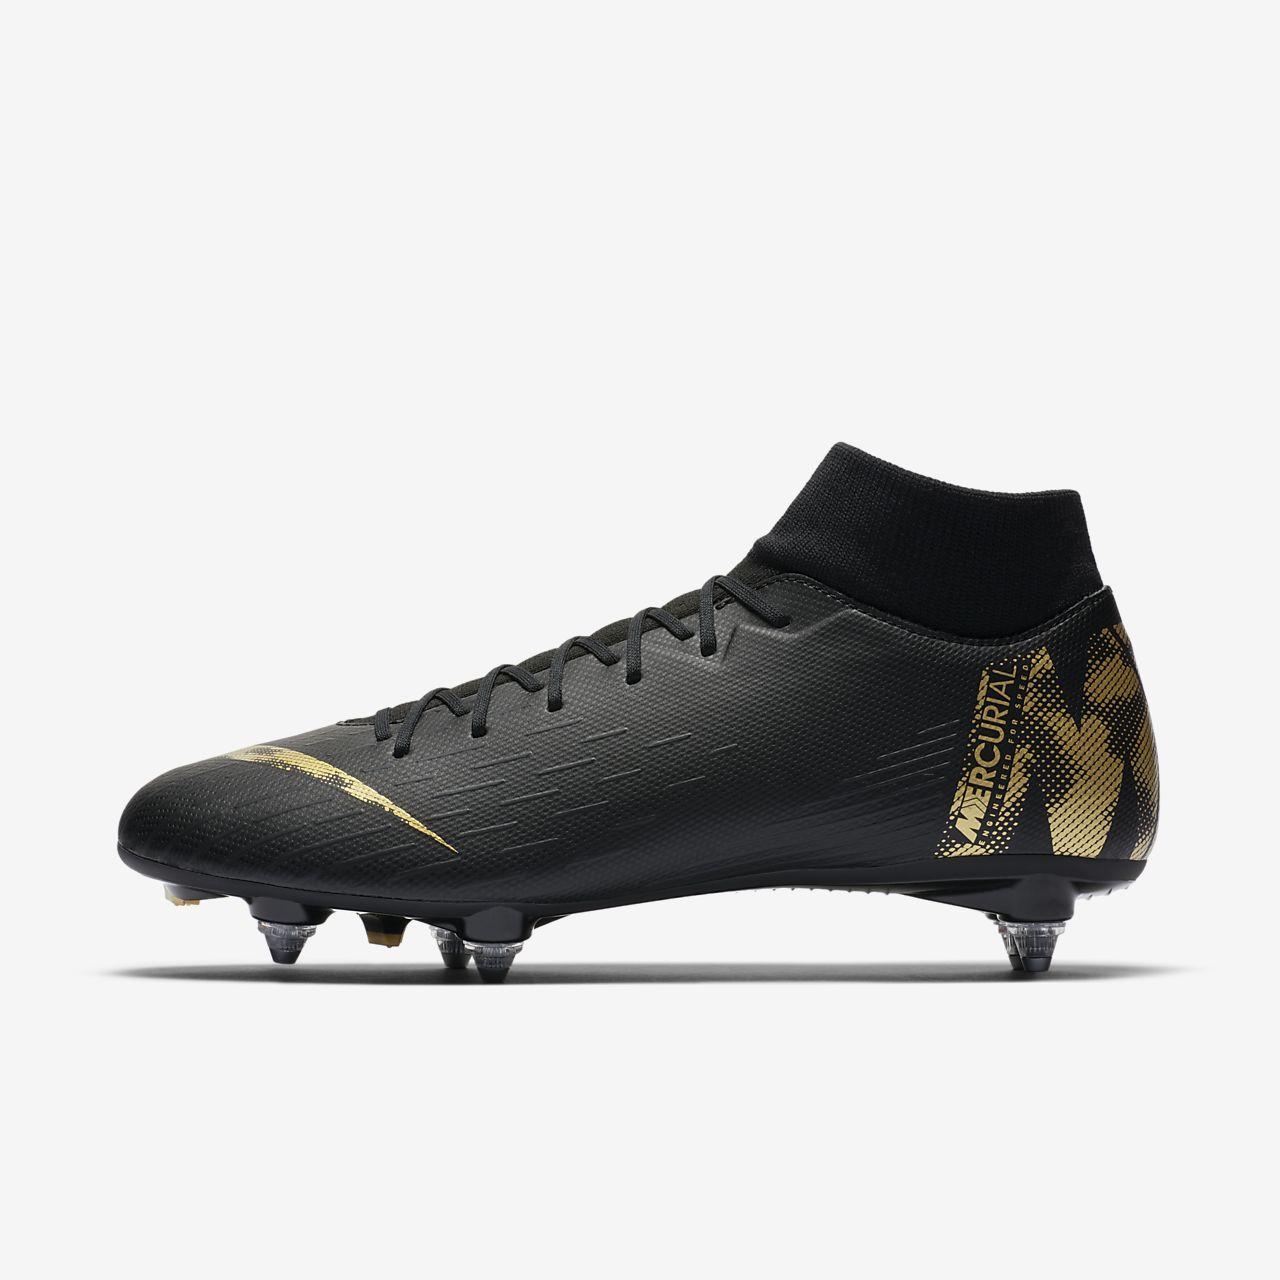 finest selection e80d8 6f52e ... Nike Mercurial Superfly VI Academy SG-PRO Voetbalschoen (zachte  ondergrond)